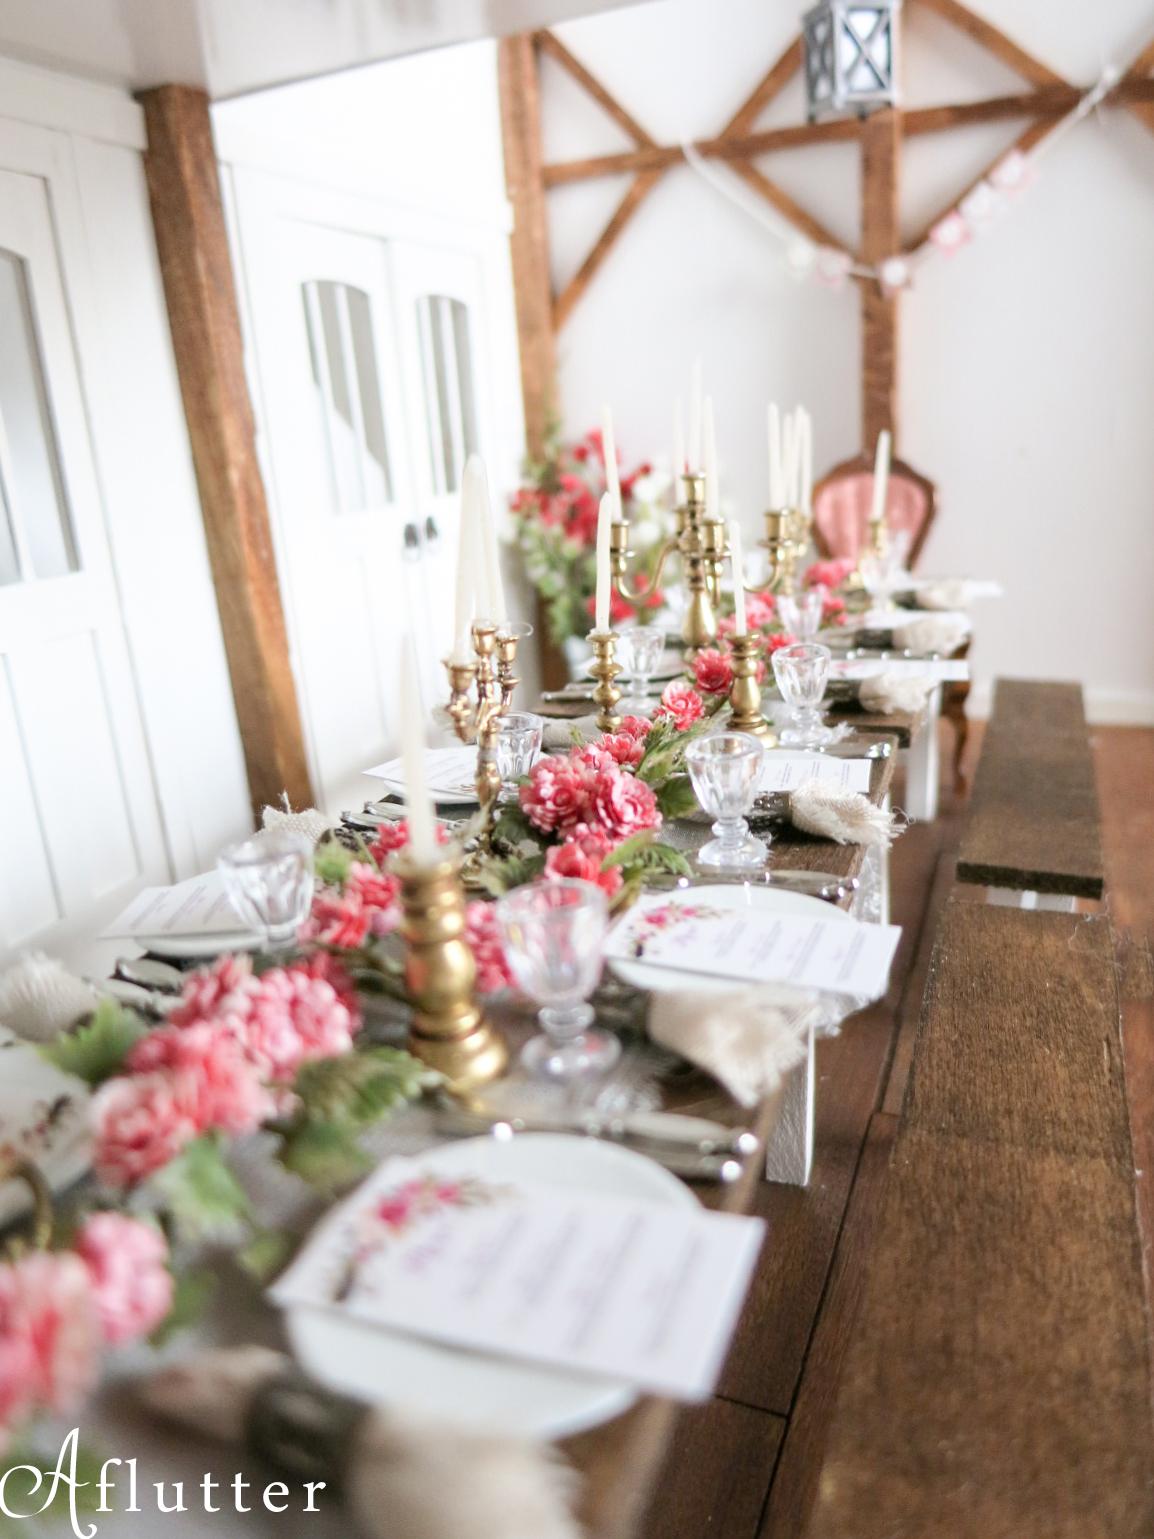 Brenul-Barn-Mini-Wedding-15-of-16.jpg